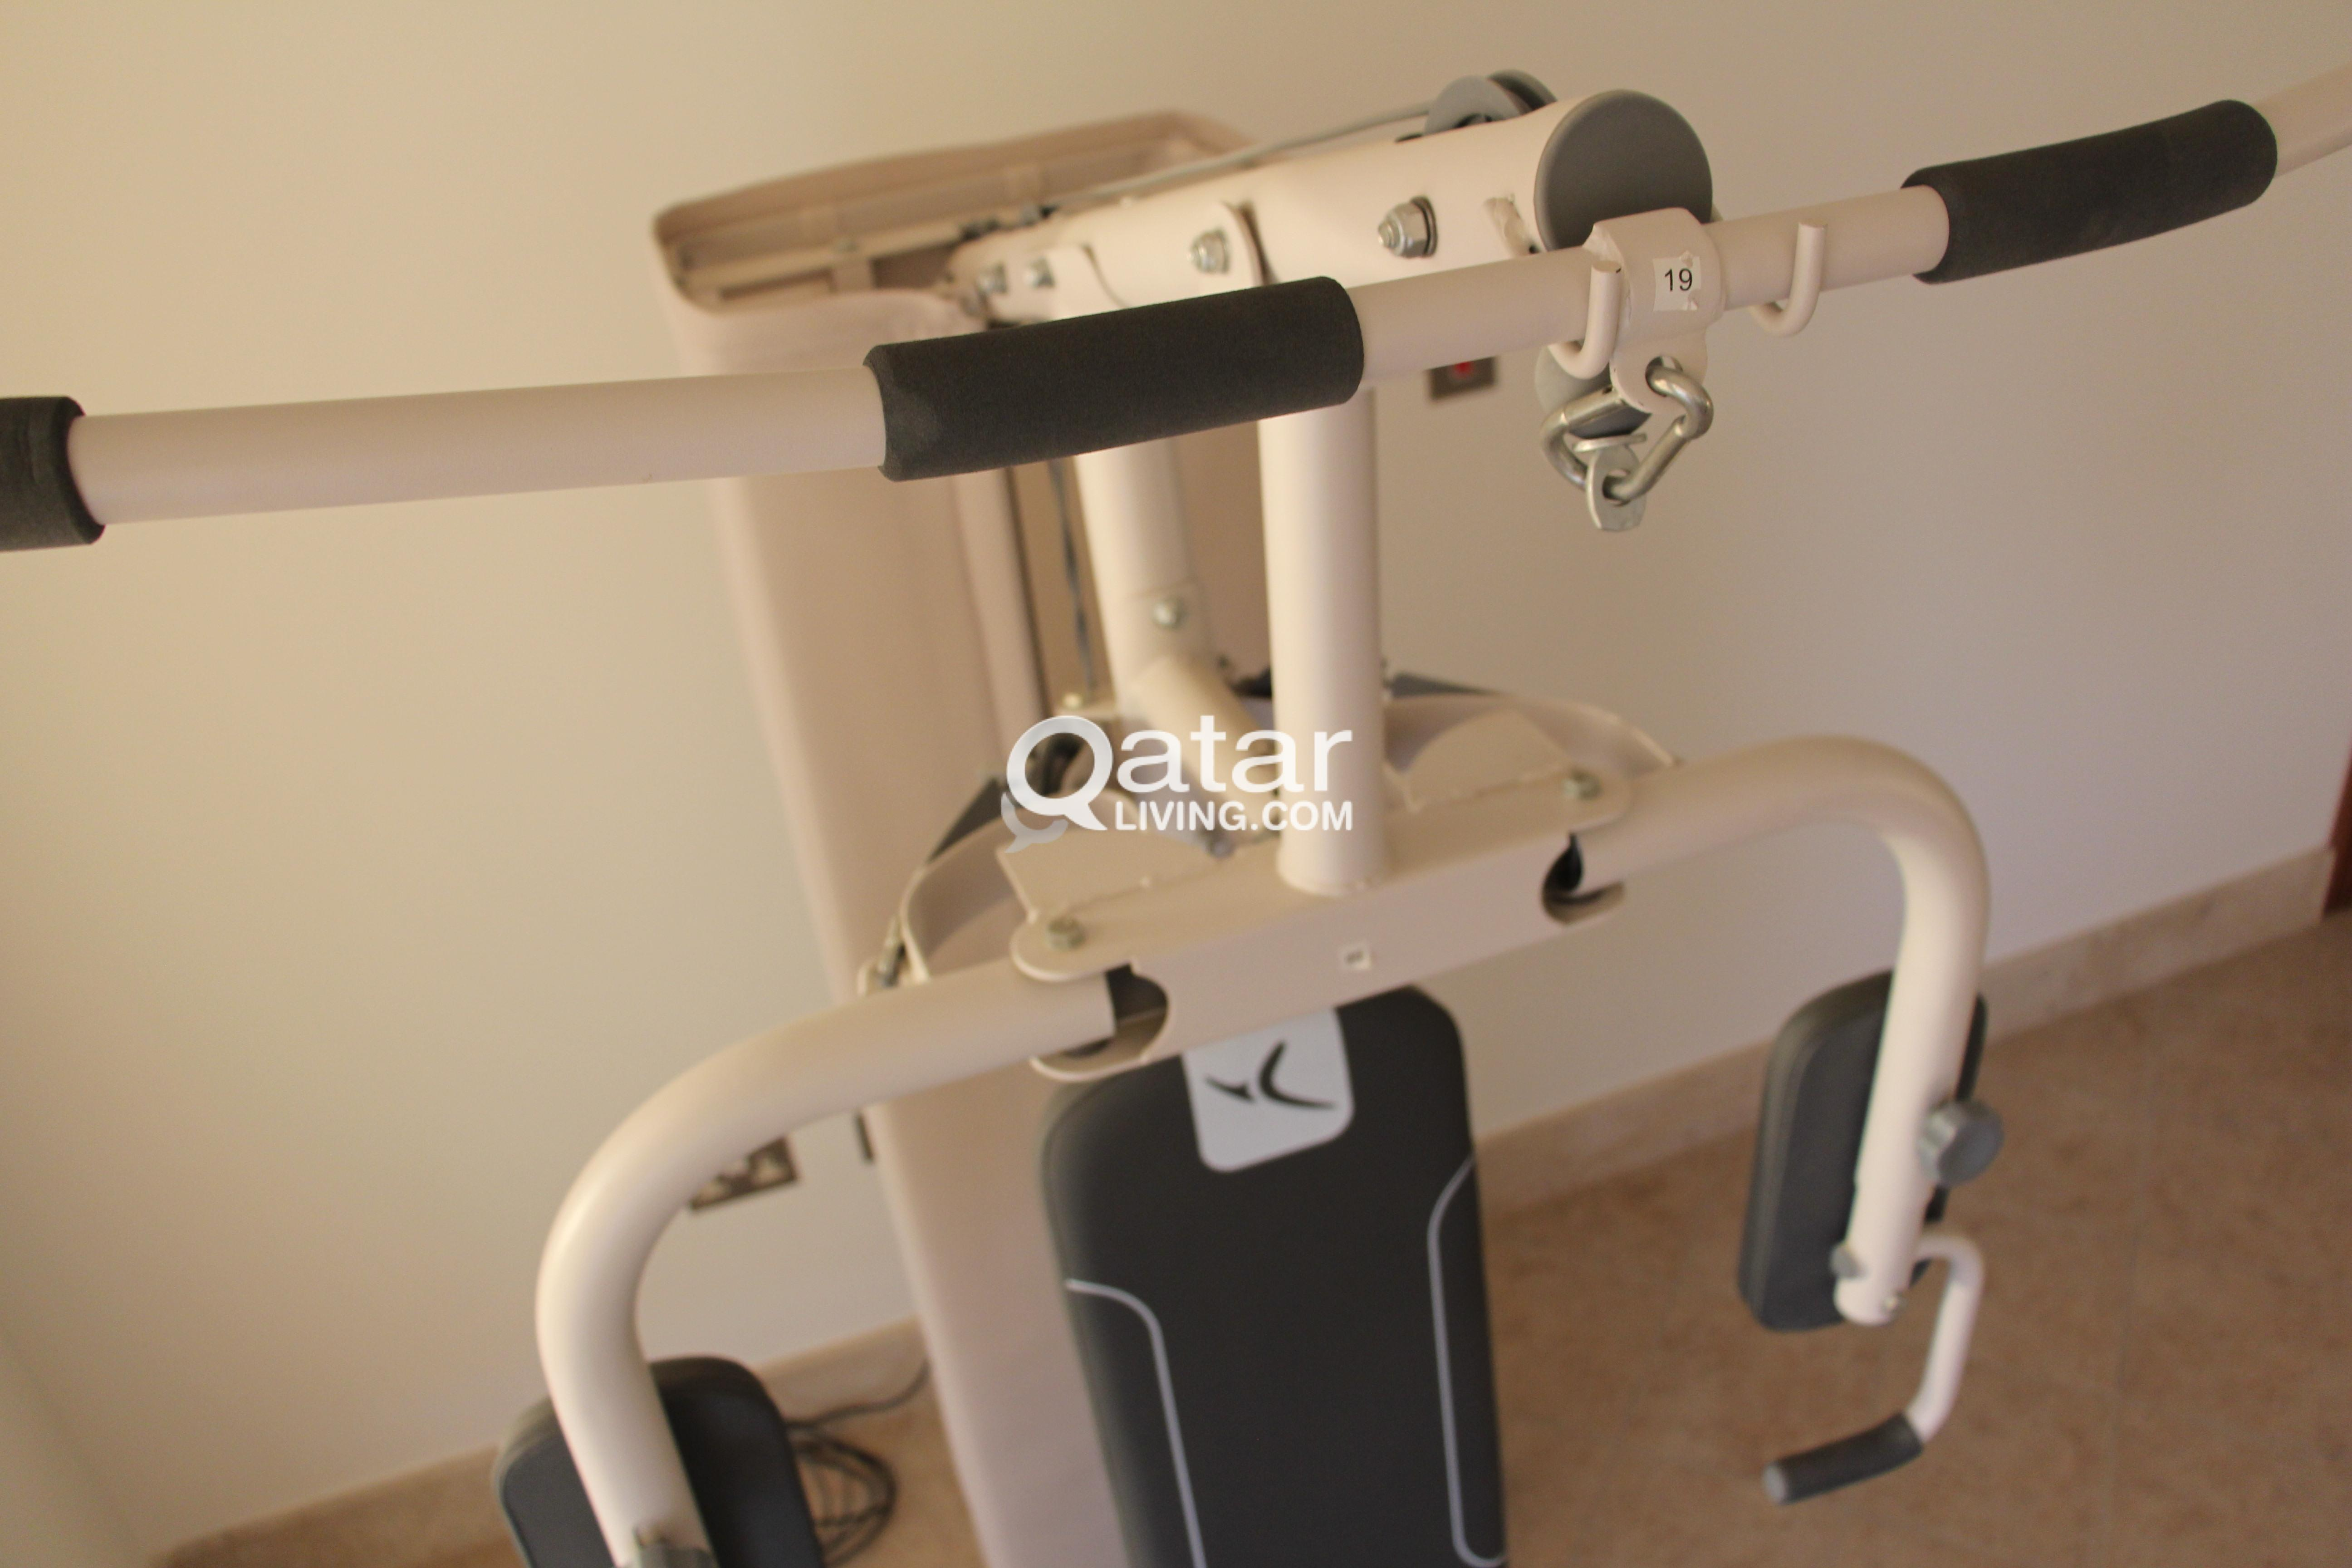 Home gym for sale brand new qatar living